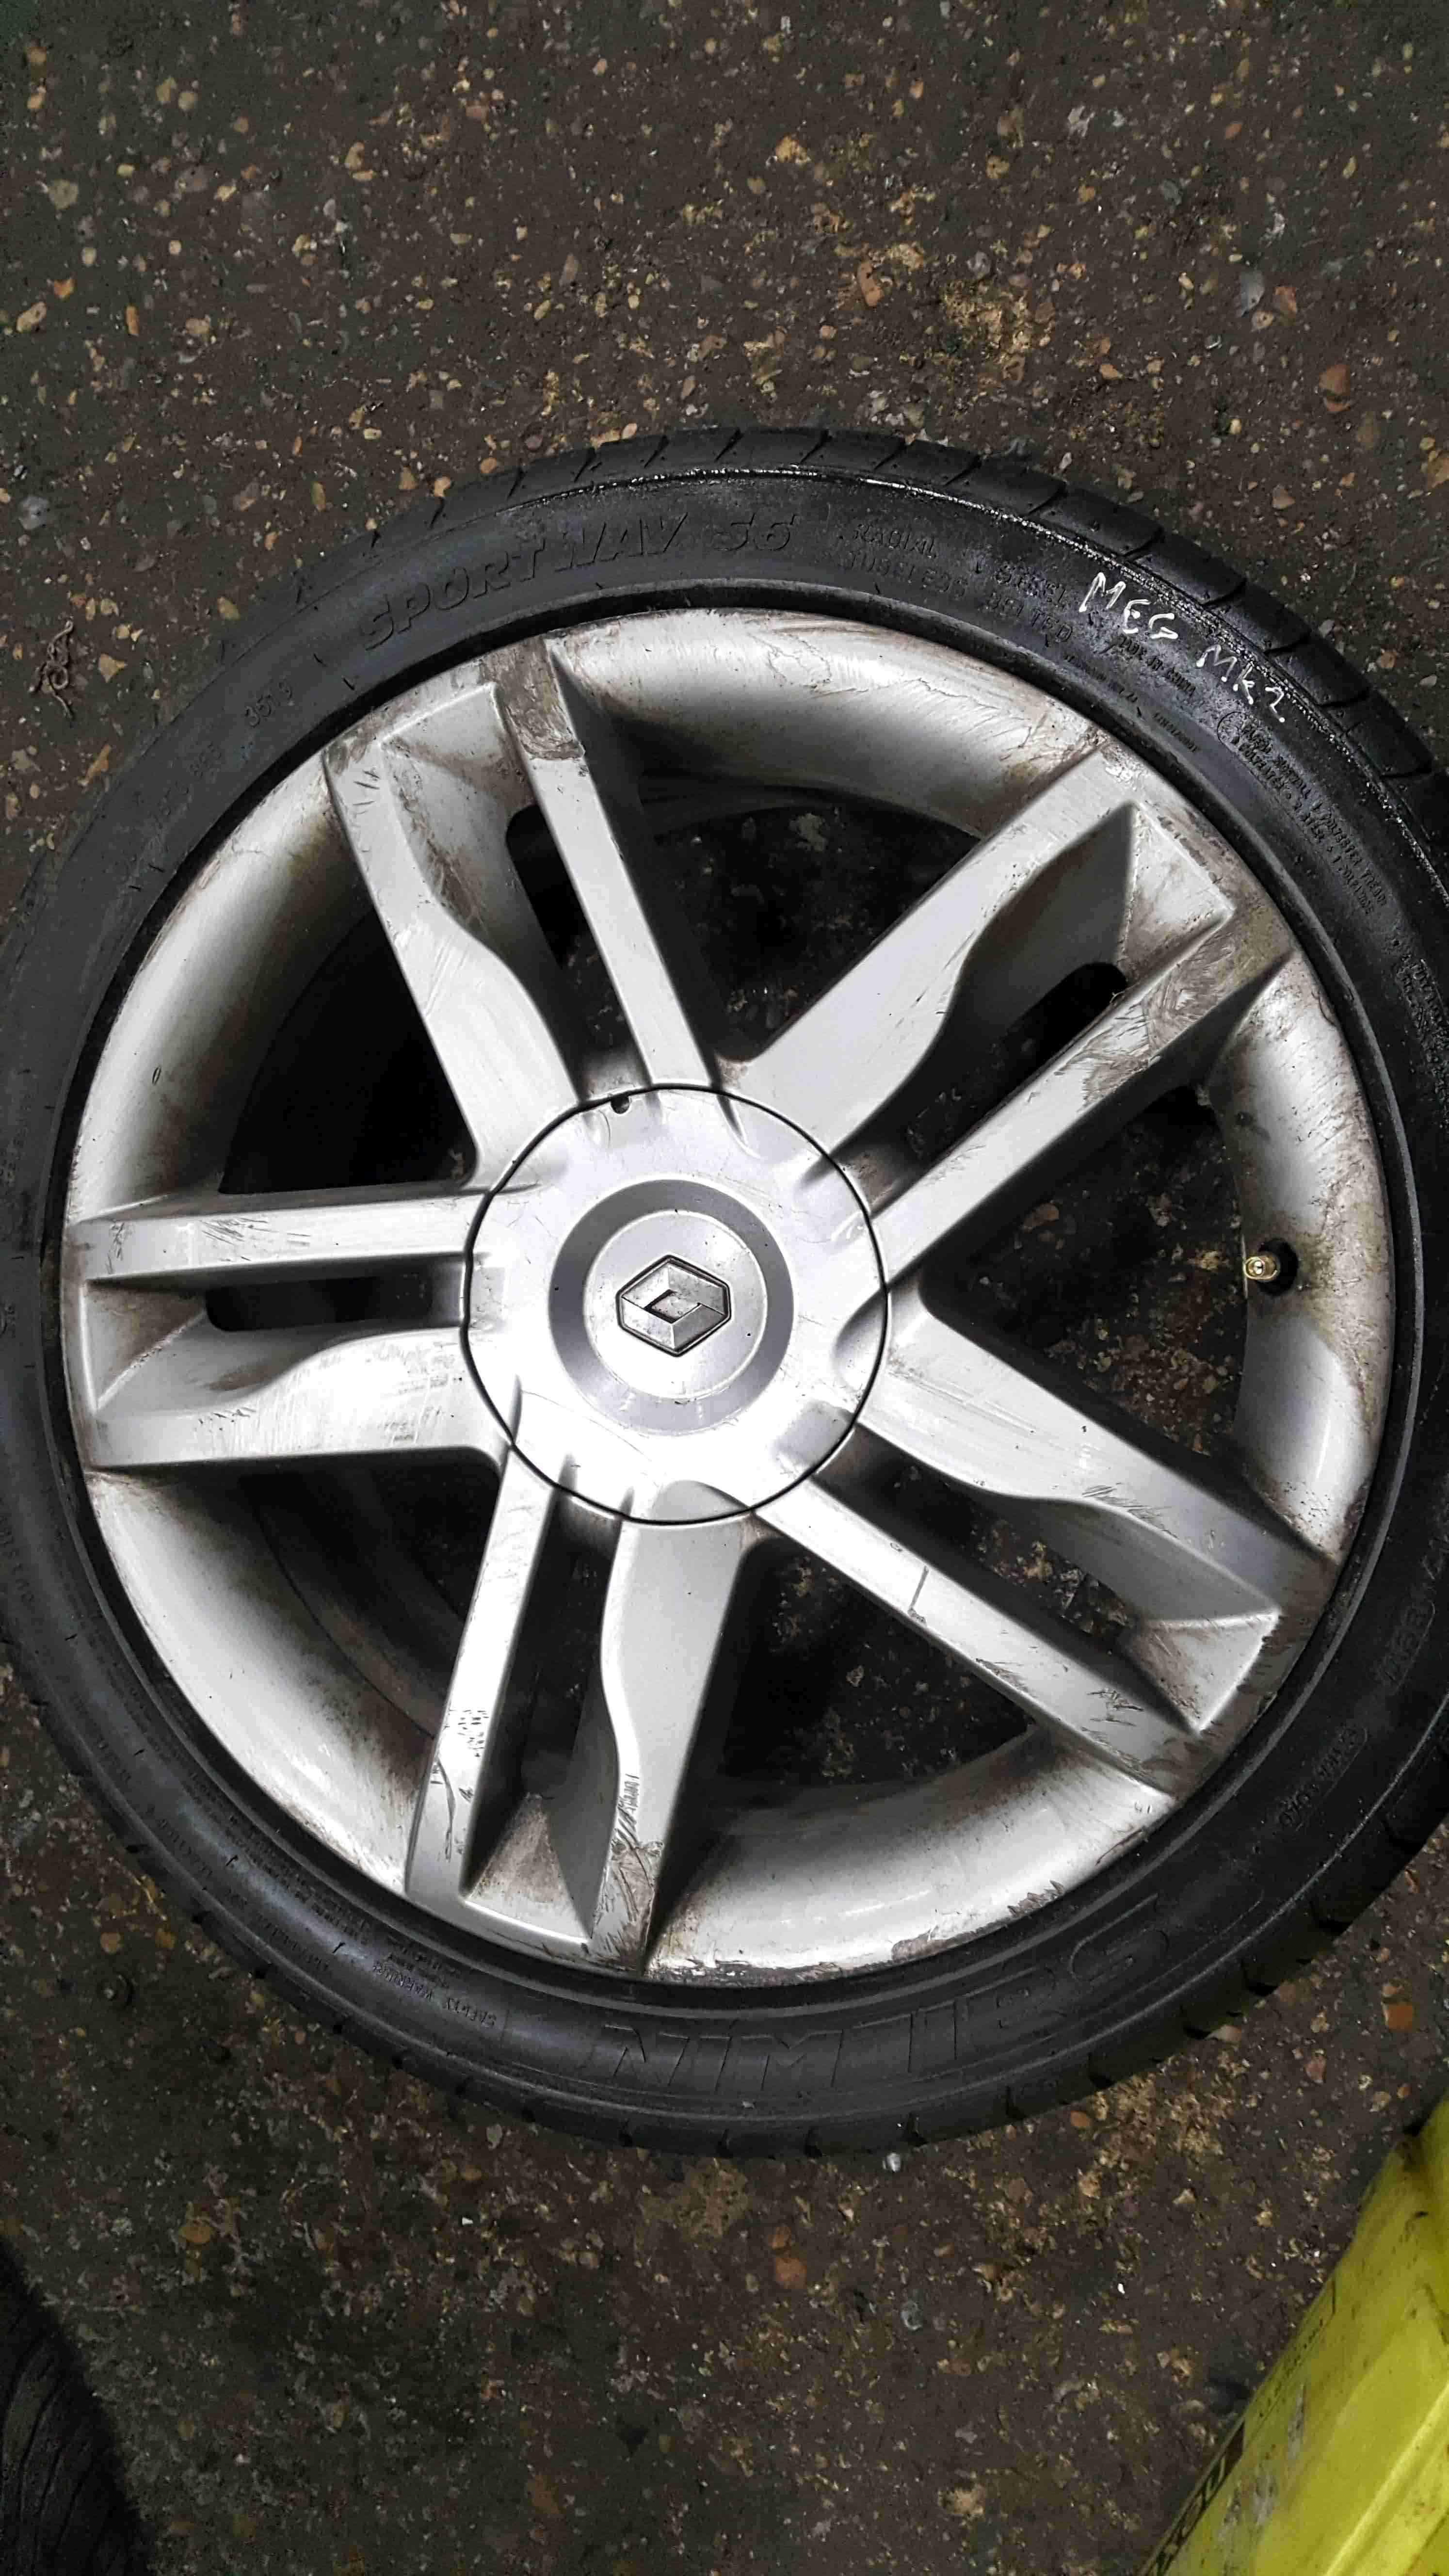 Renault Megane Sport MK2 2002-2008 175 Celcius Alloy Wheel + Tyre 205 45 17 5mm